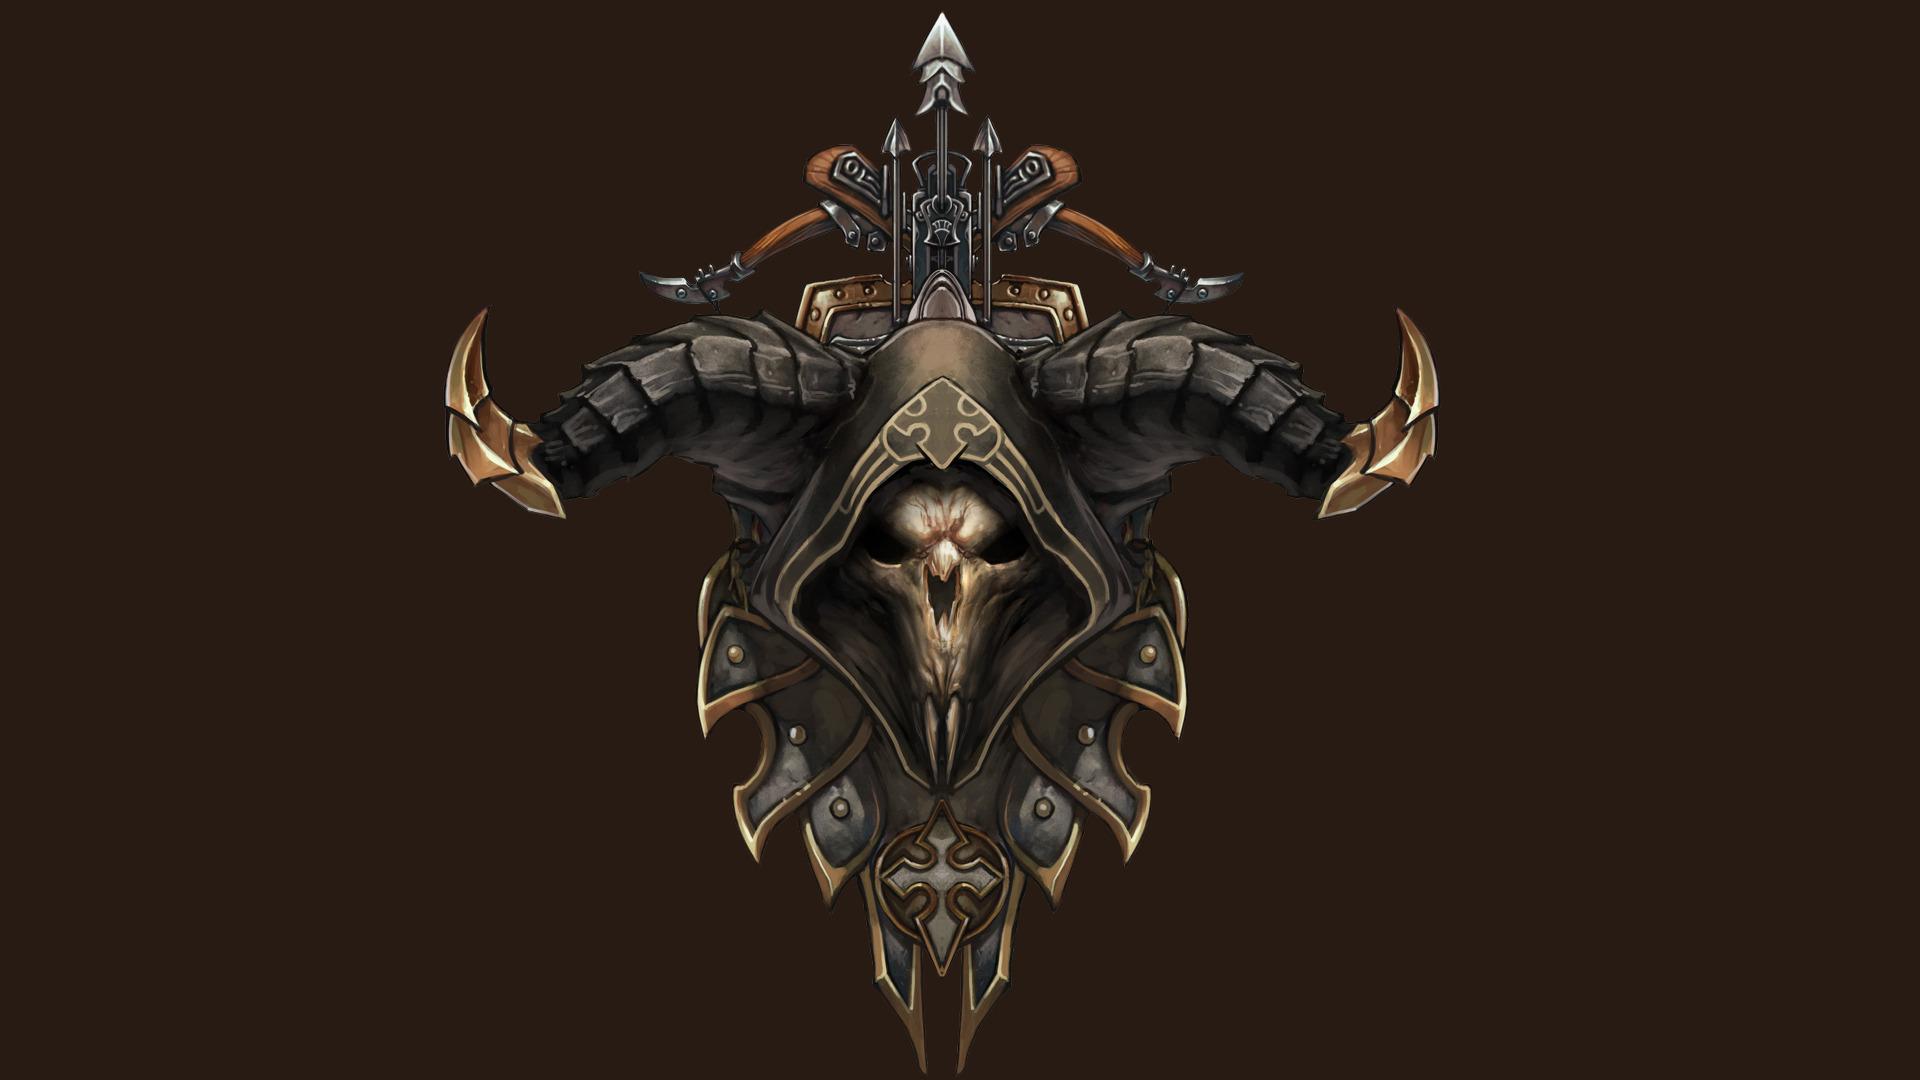 Demon Hunter Diablo III Wallpaper 1070473 1920x1080